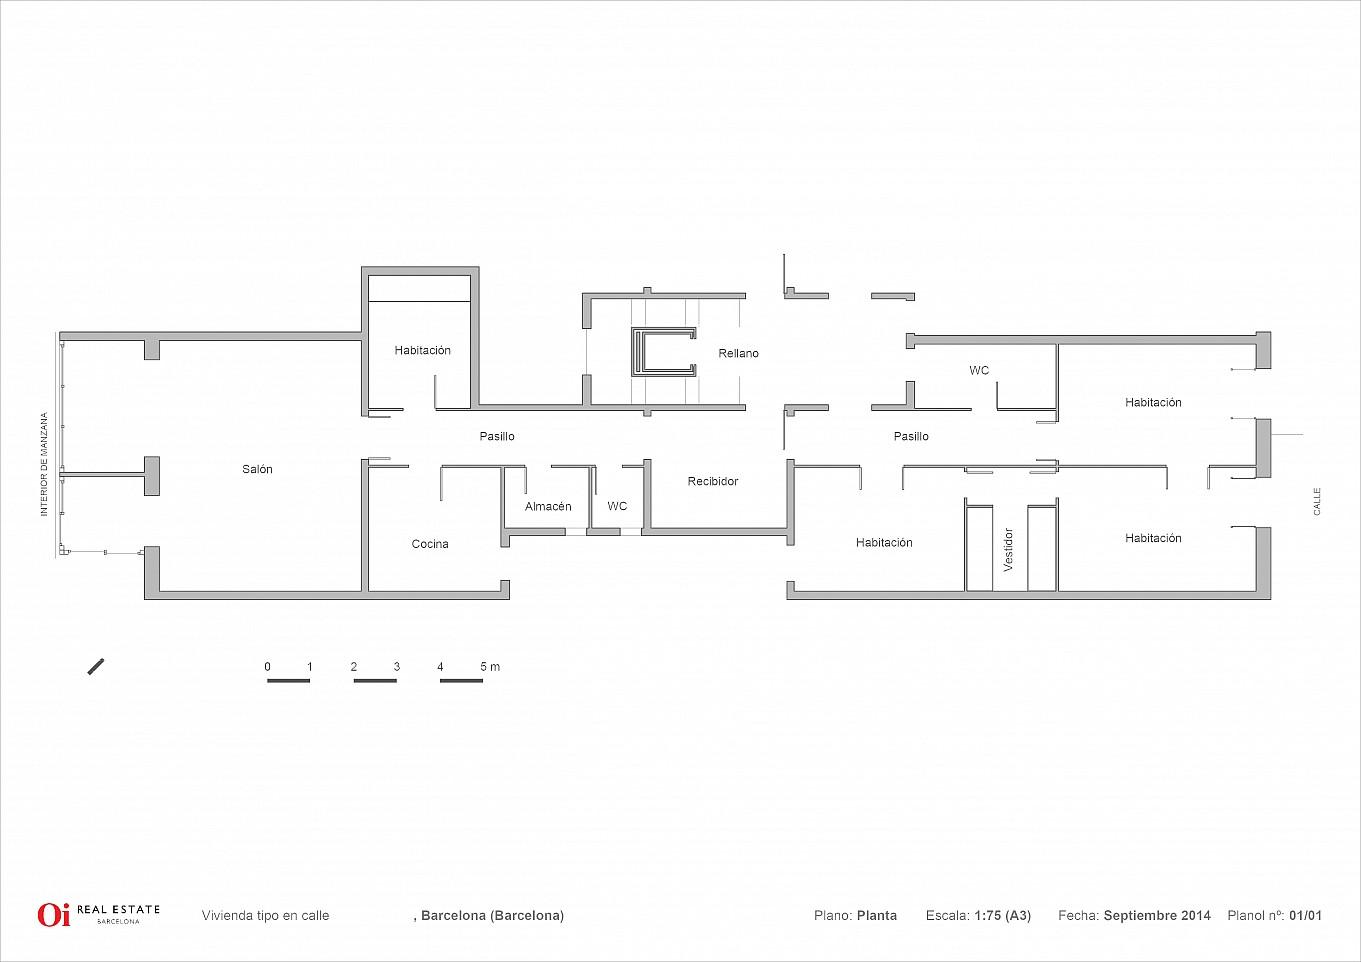 План здания на продажу в Барселоне в районе Эшампле